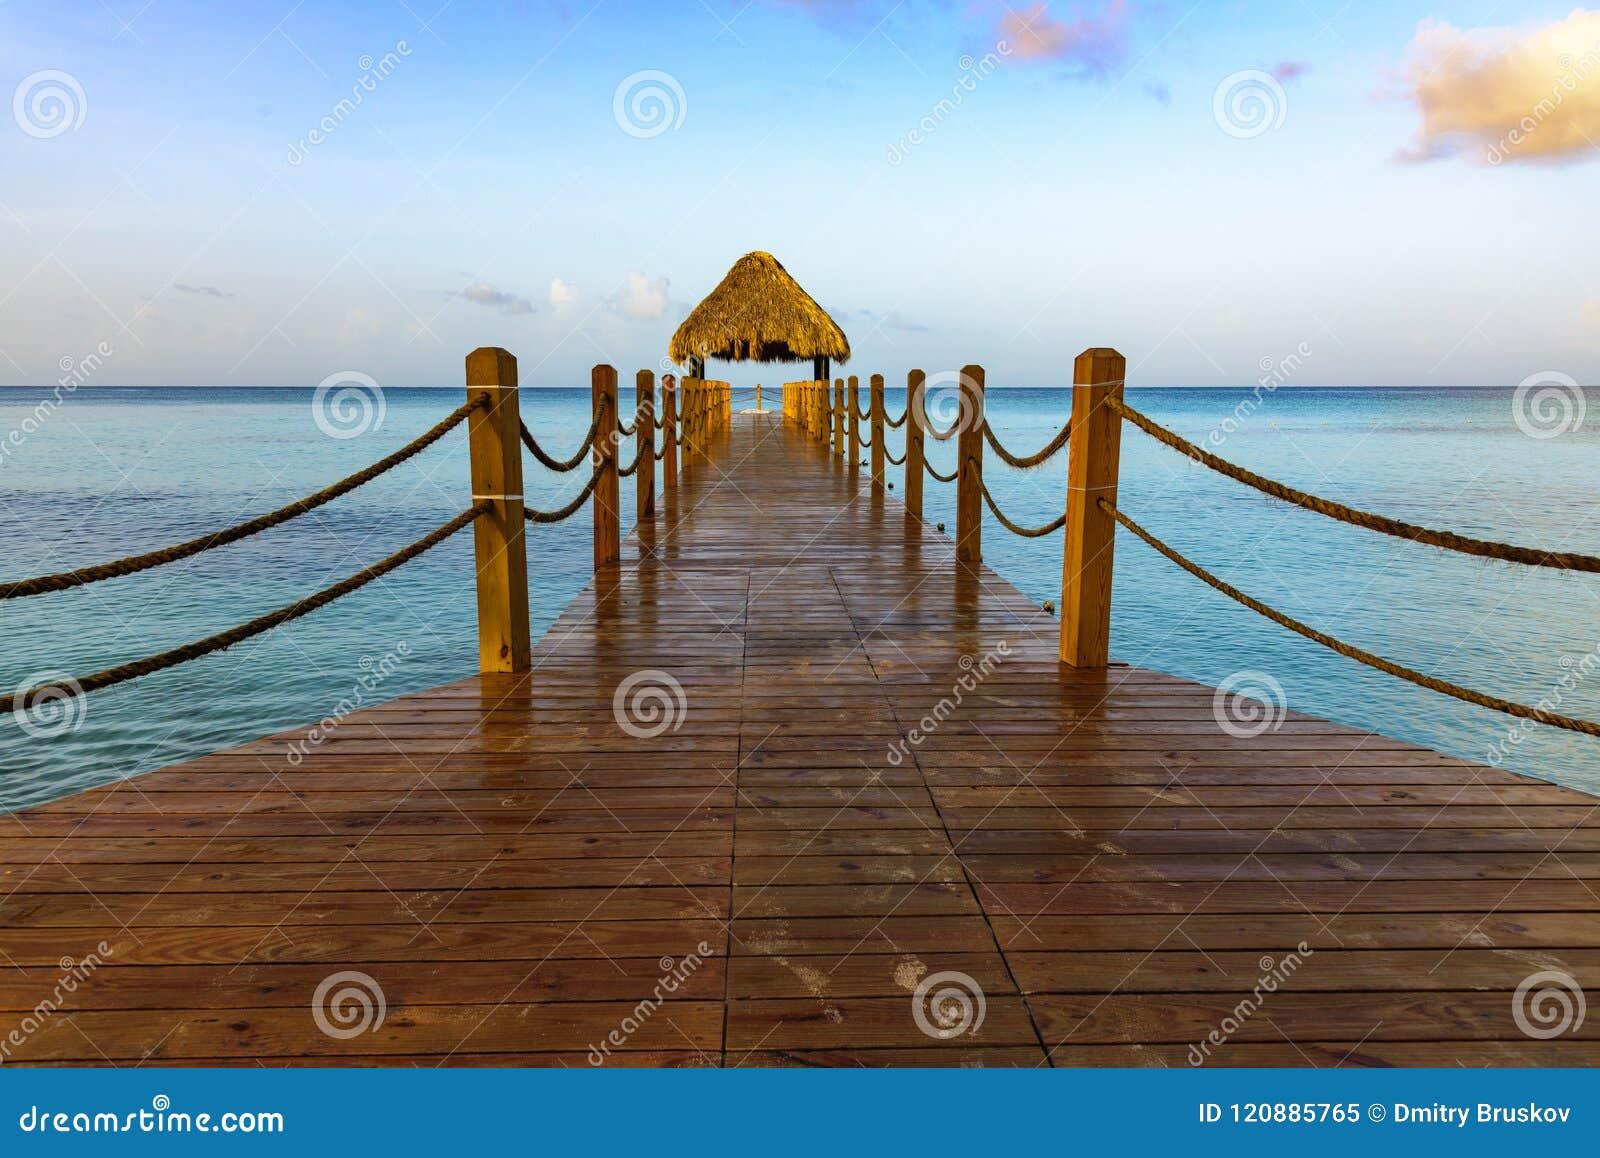 Dream Dream Pier, what dreams Pier in a dream to see 31